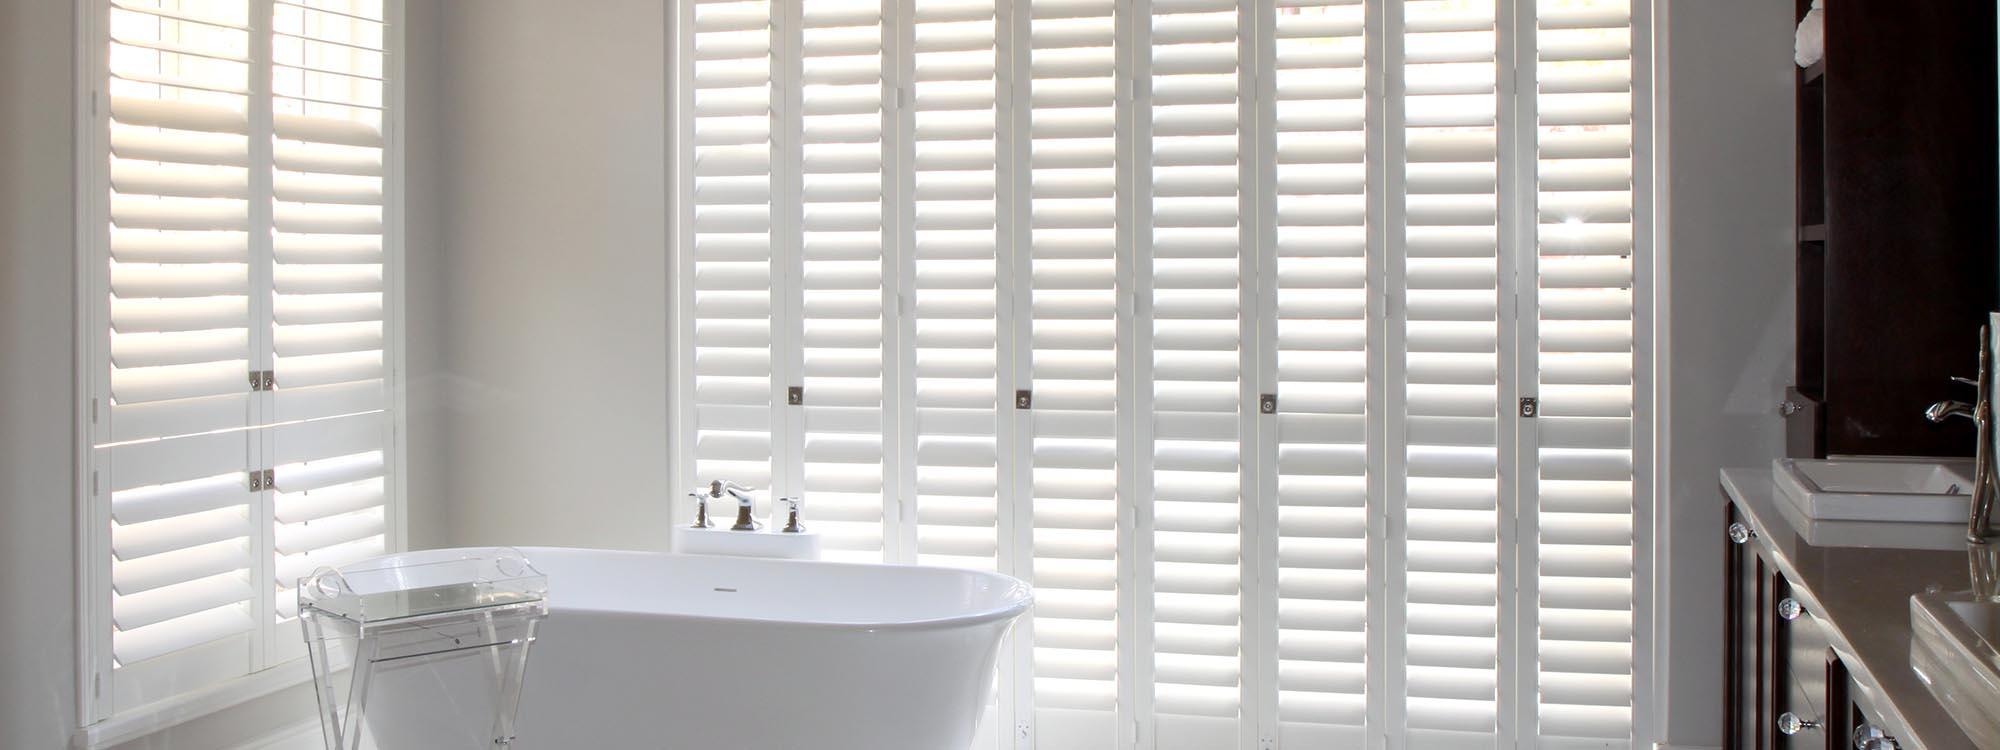 Decowood-shutters-bathroom-white